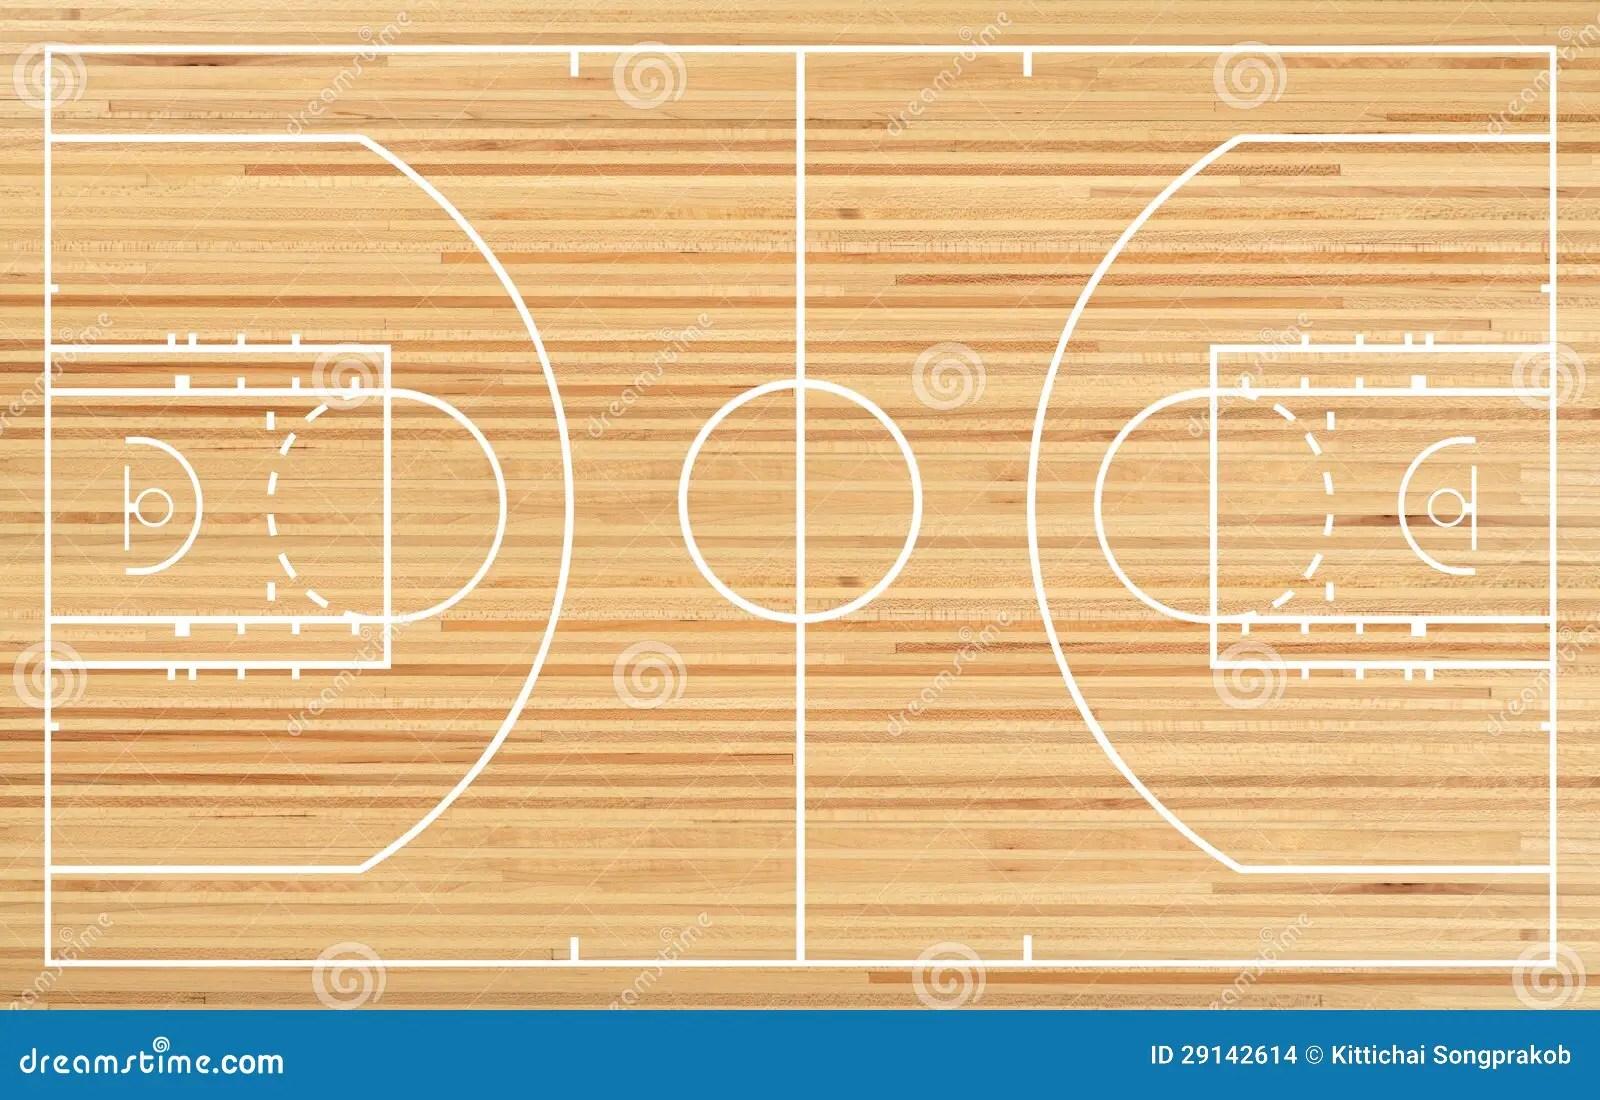 Basketball Court Stock Illustration. Illustration Of Fake